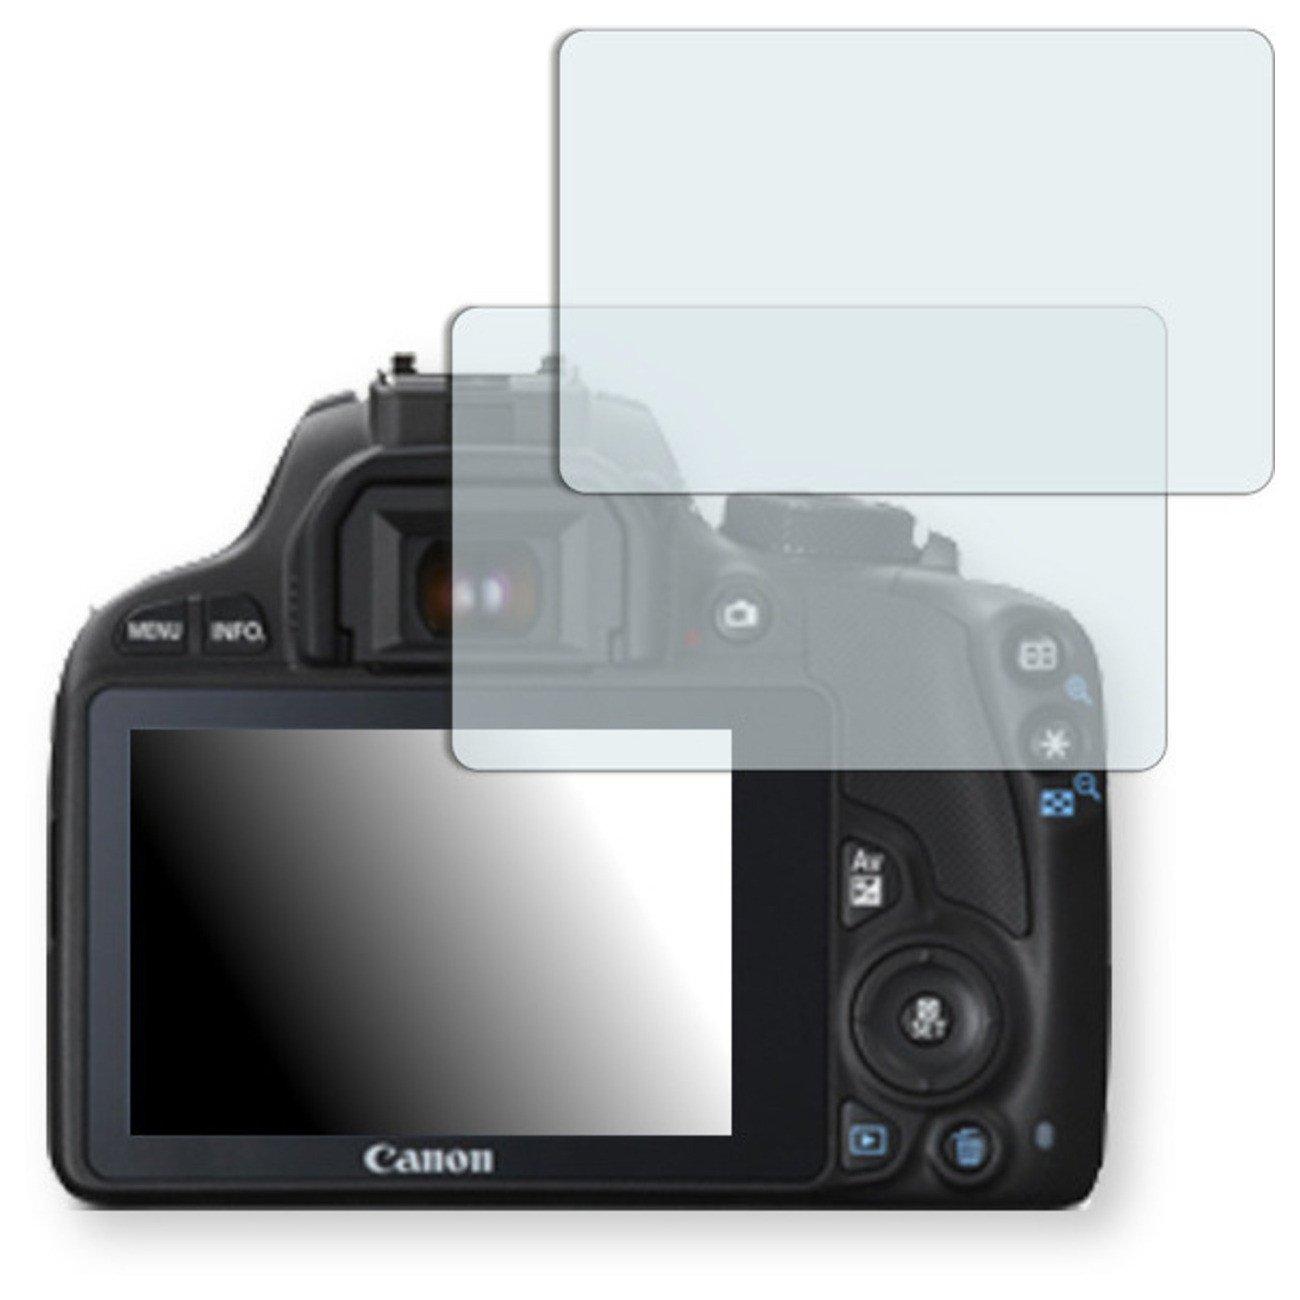 2x Golebo Anti-Glare screen protector for Canon EOS SL1 (Anti-Reflex, Air pocket free application, Easy to remove)